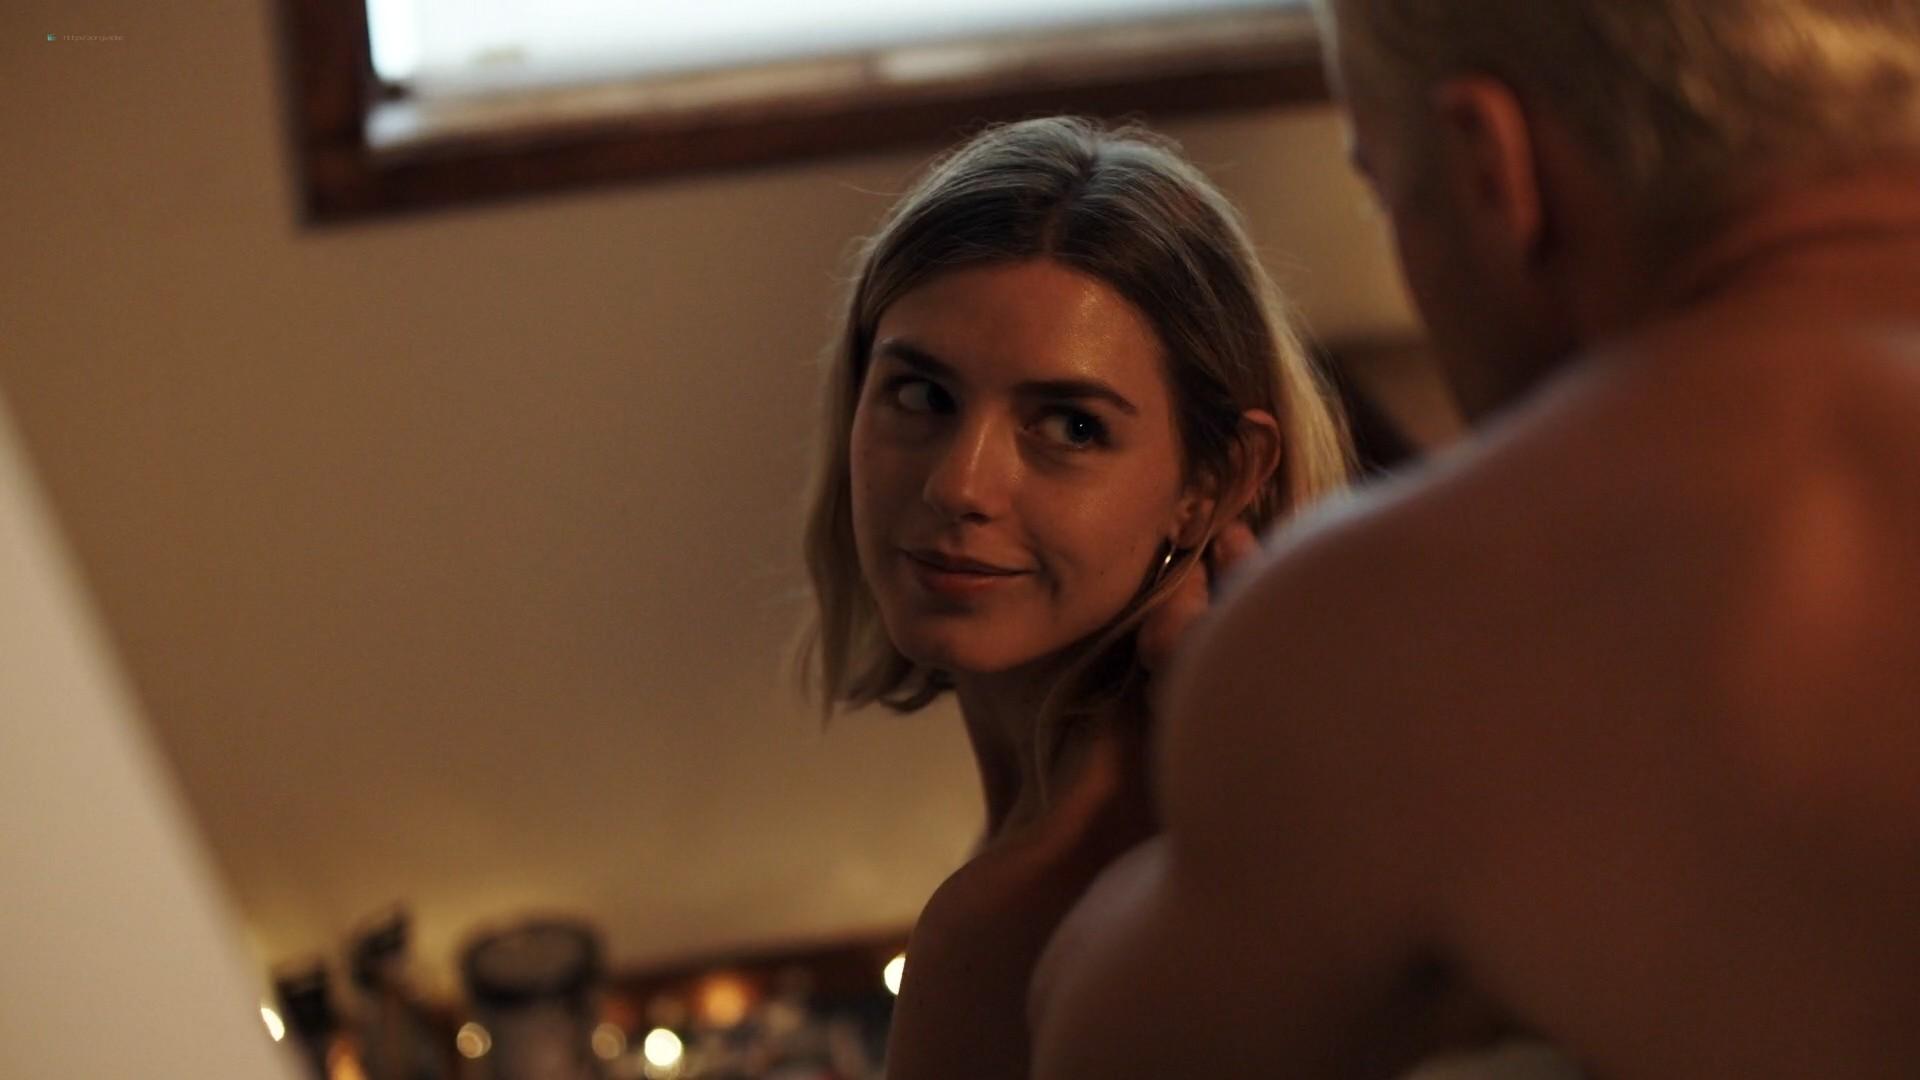 Caroline Vreeland busty see through Zoe Chait, Kenzie Dalton hot - Red Handed (2019) 1080p Web (14)